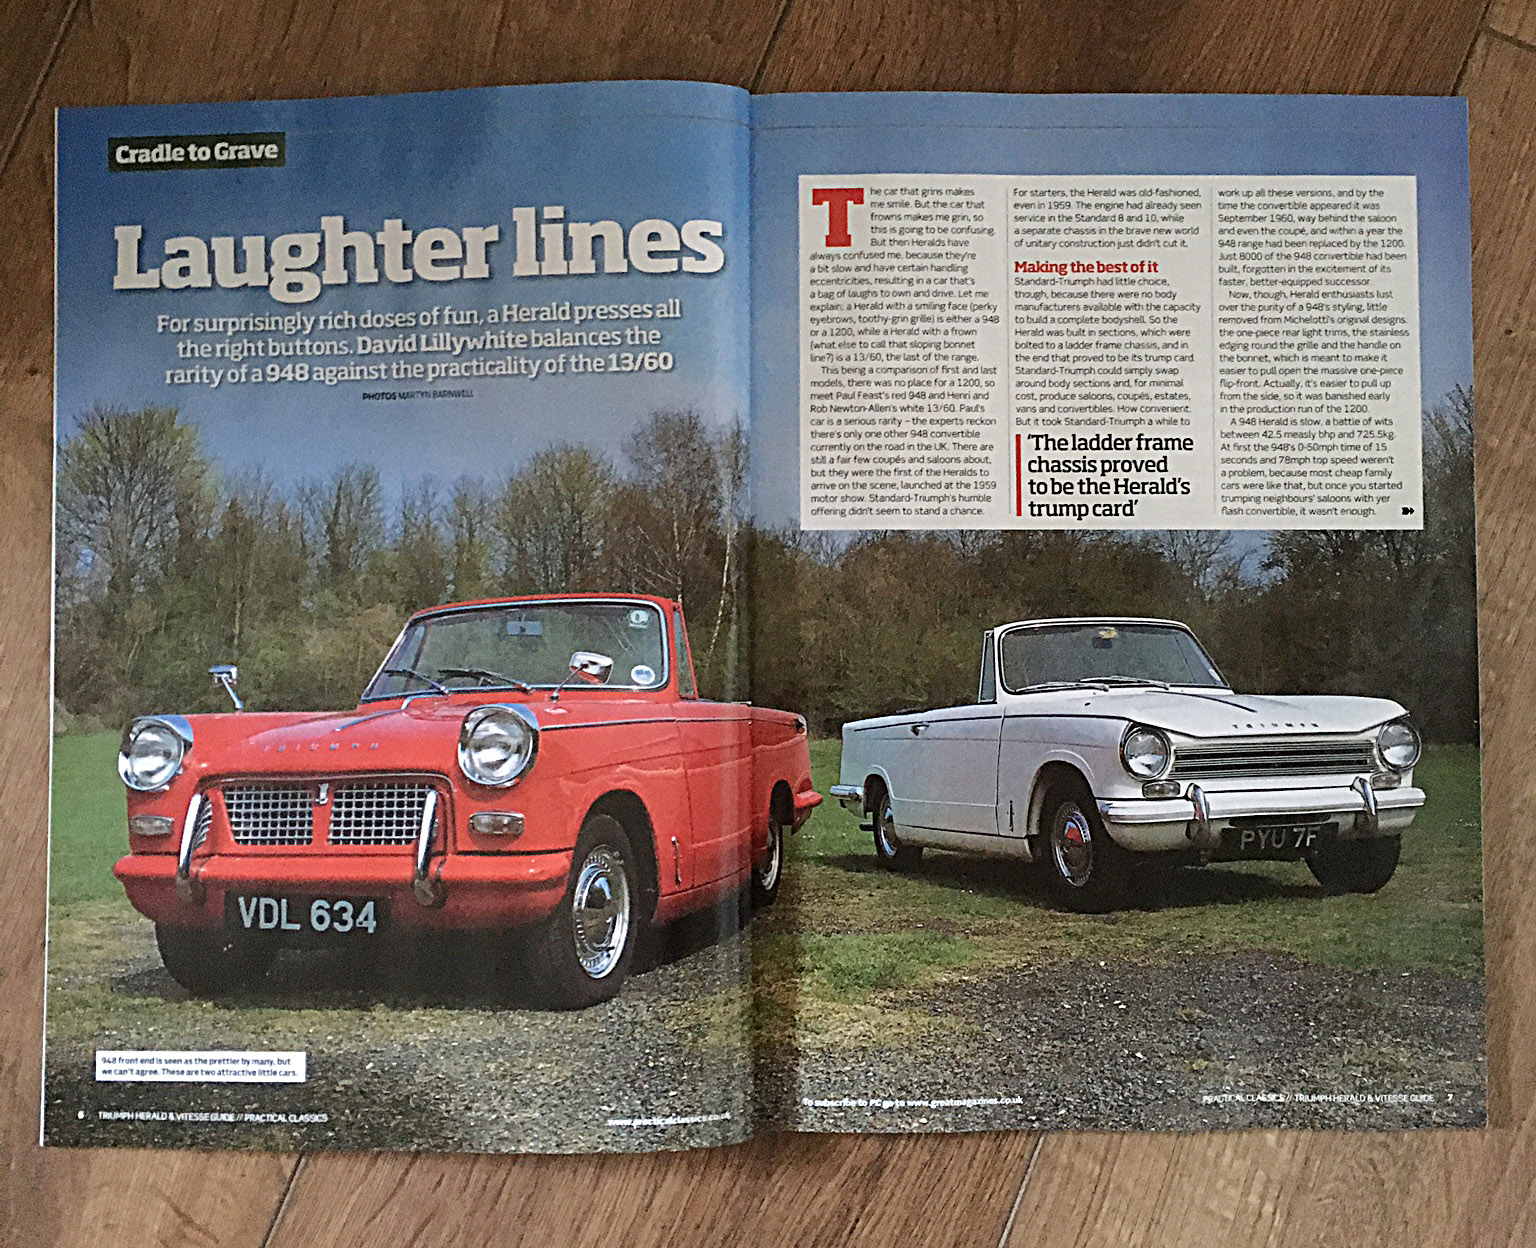 New Triumph Herald Magazine From Practical Classics The 948cc